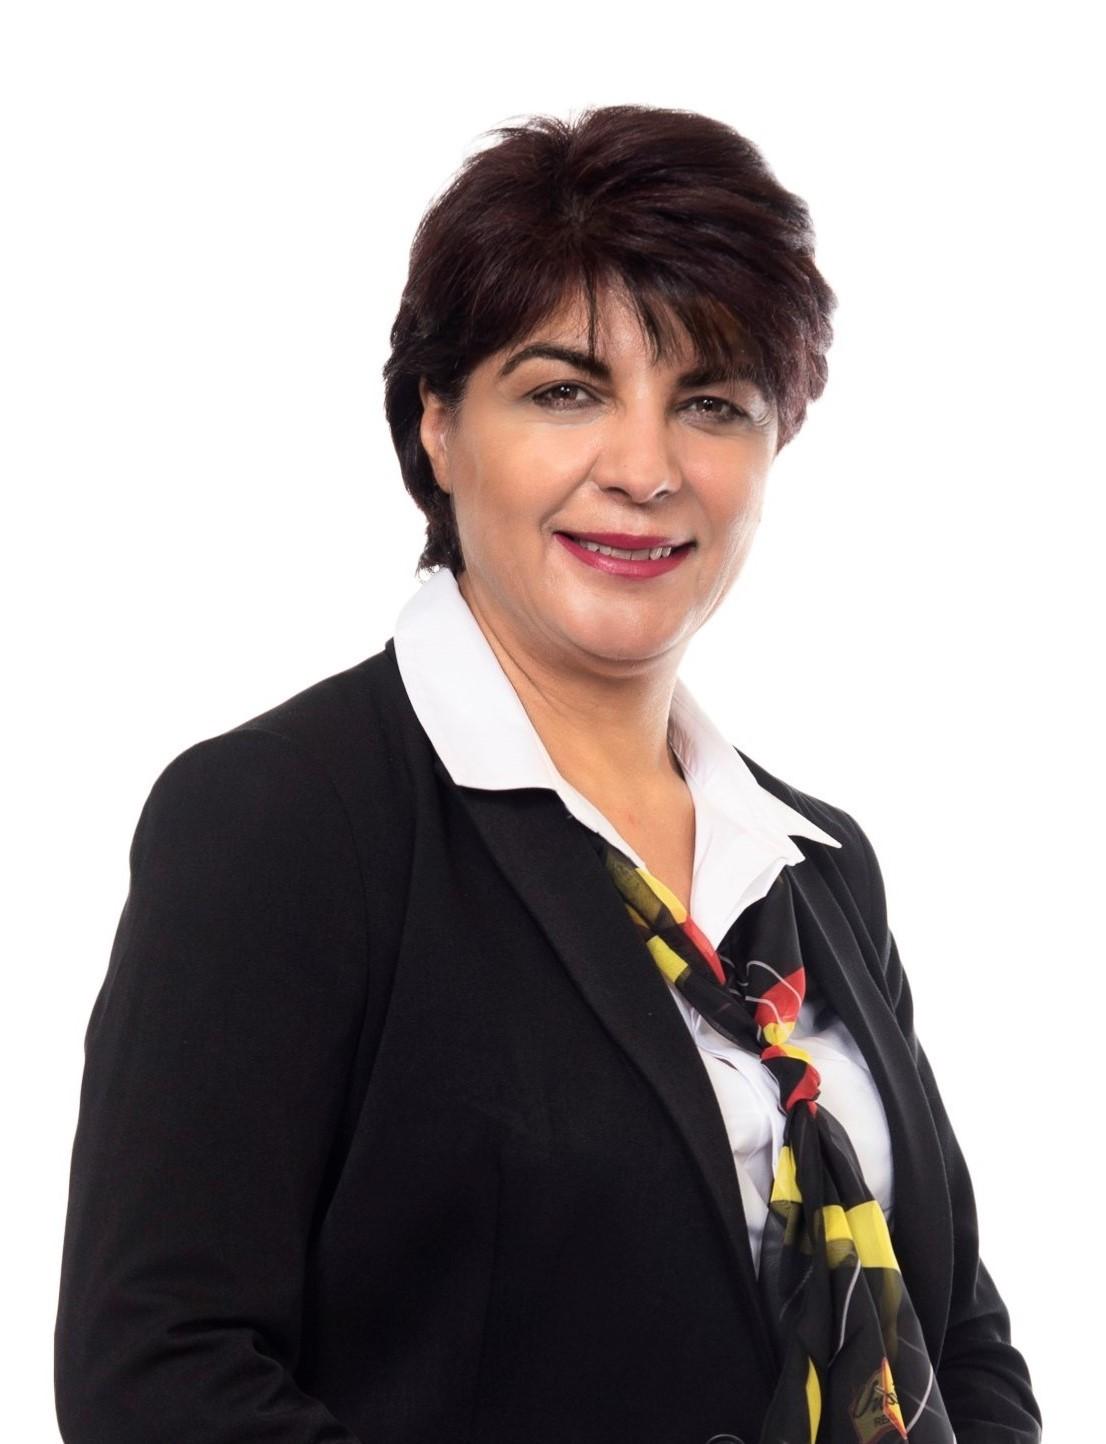 Phyllis Scarfone